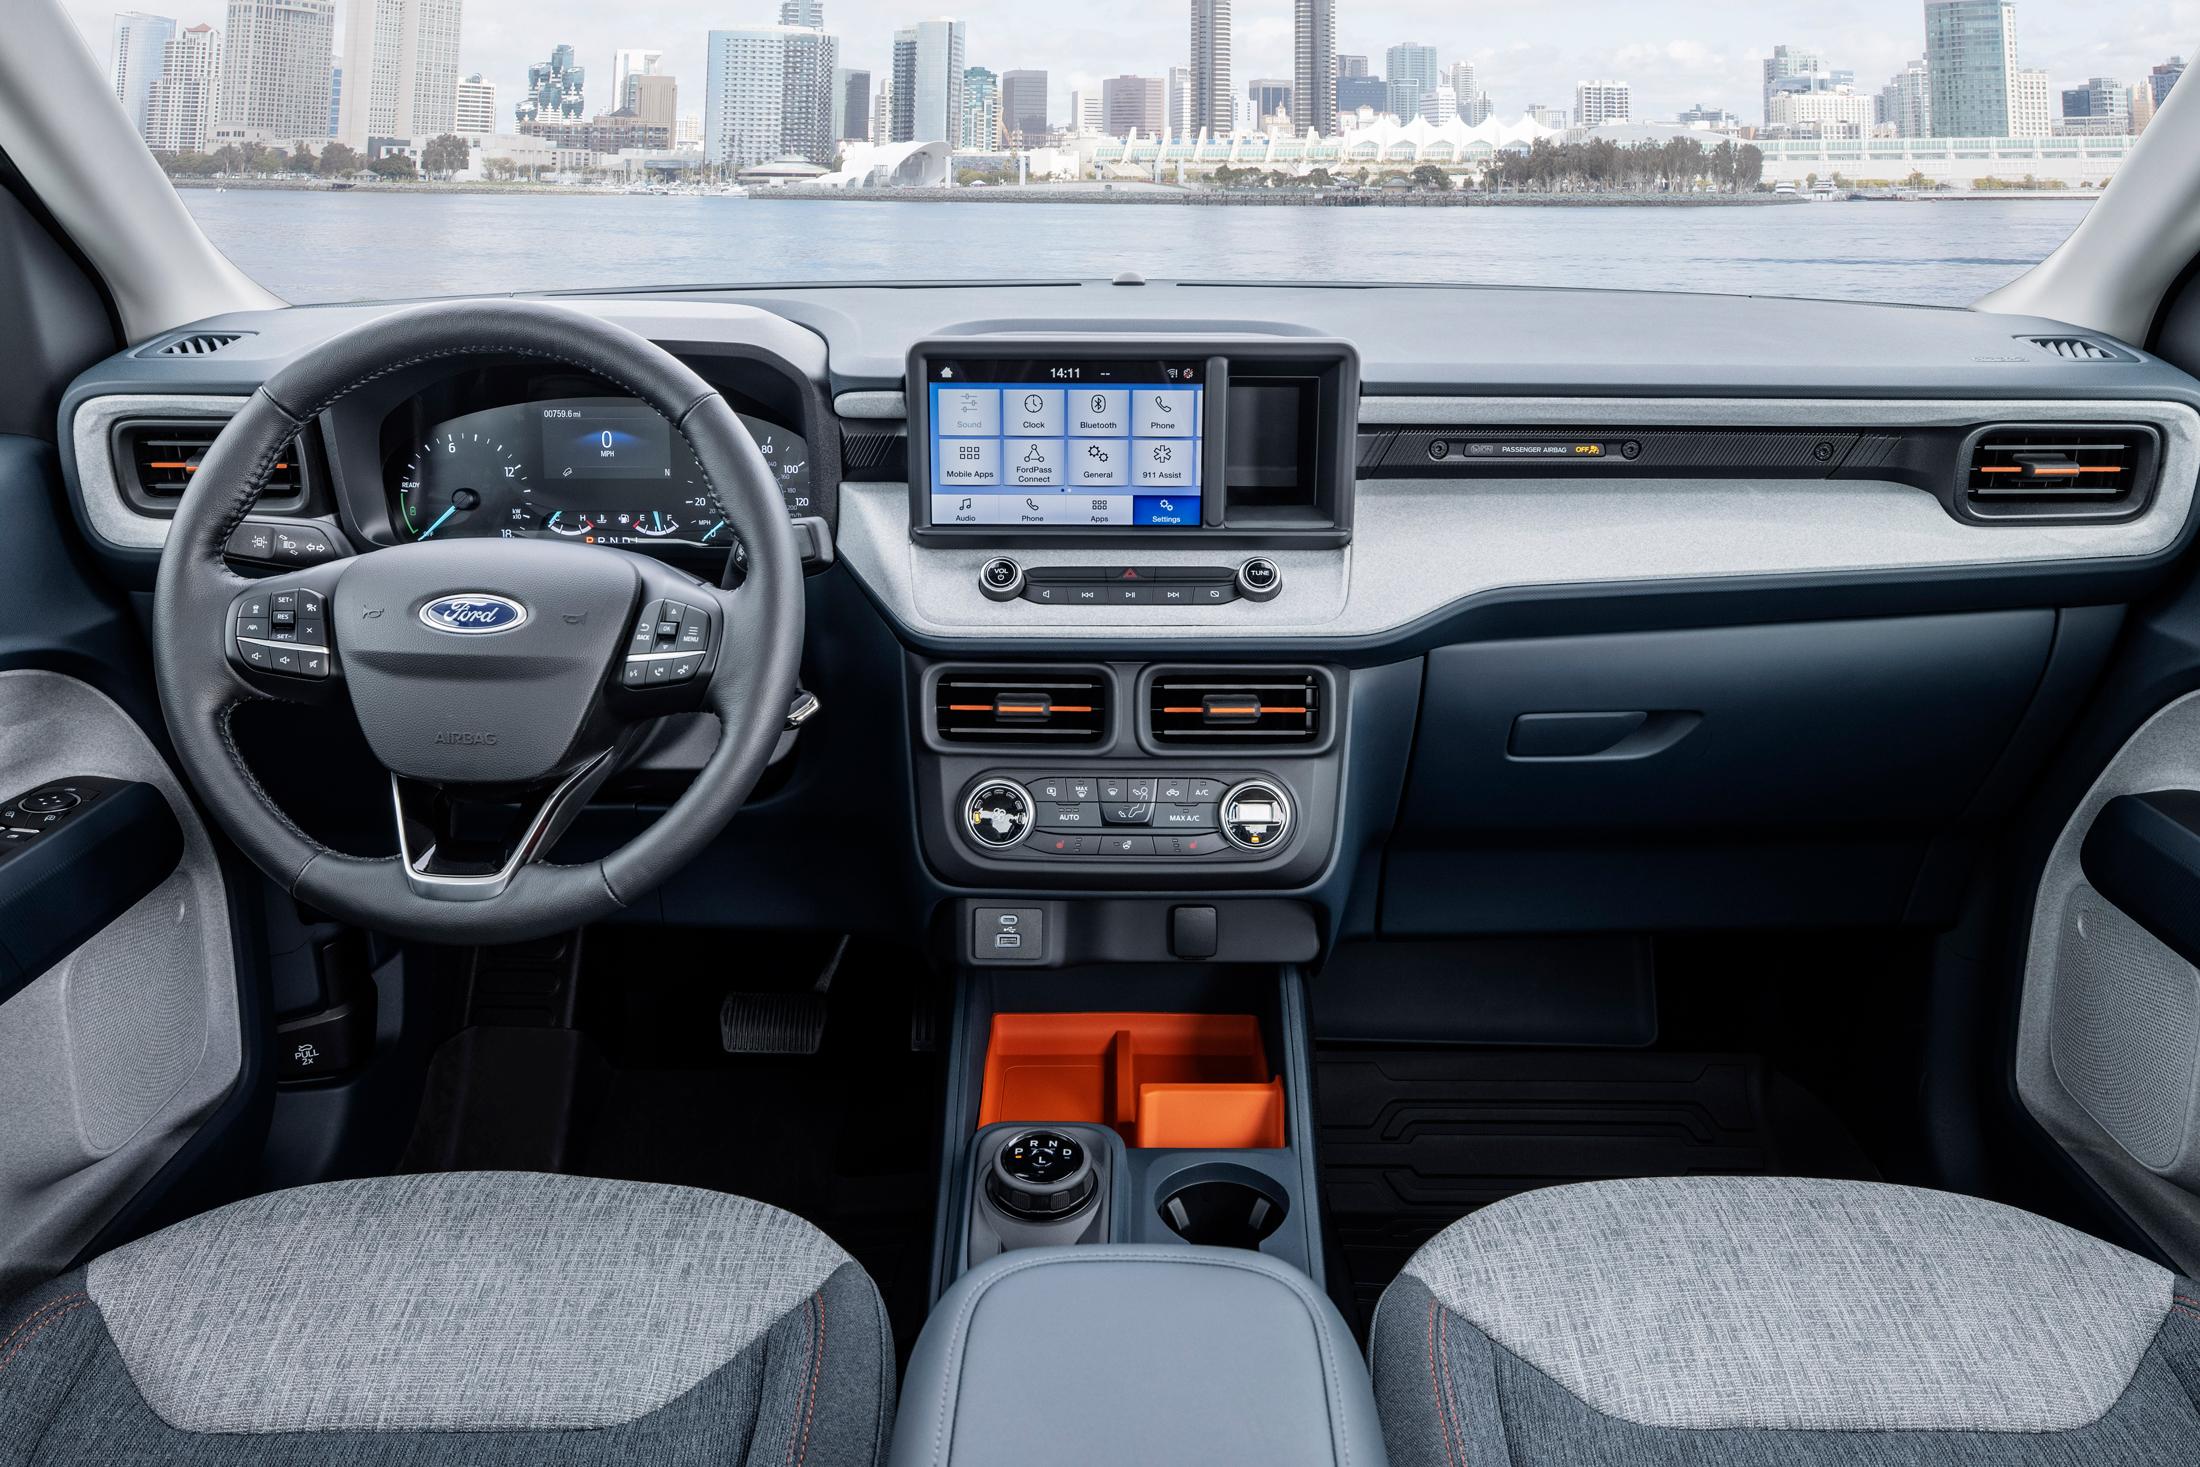 Ford Maverick hybrid pickup truck